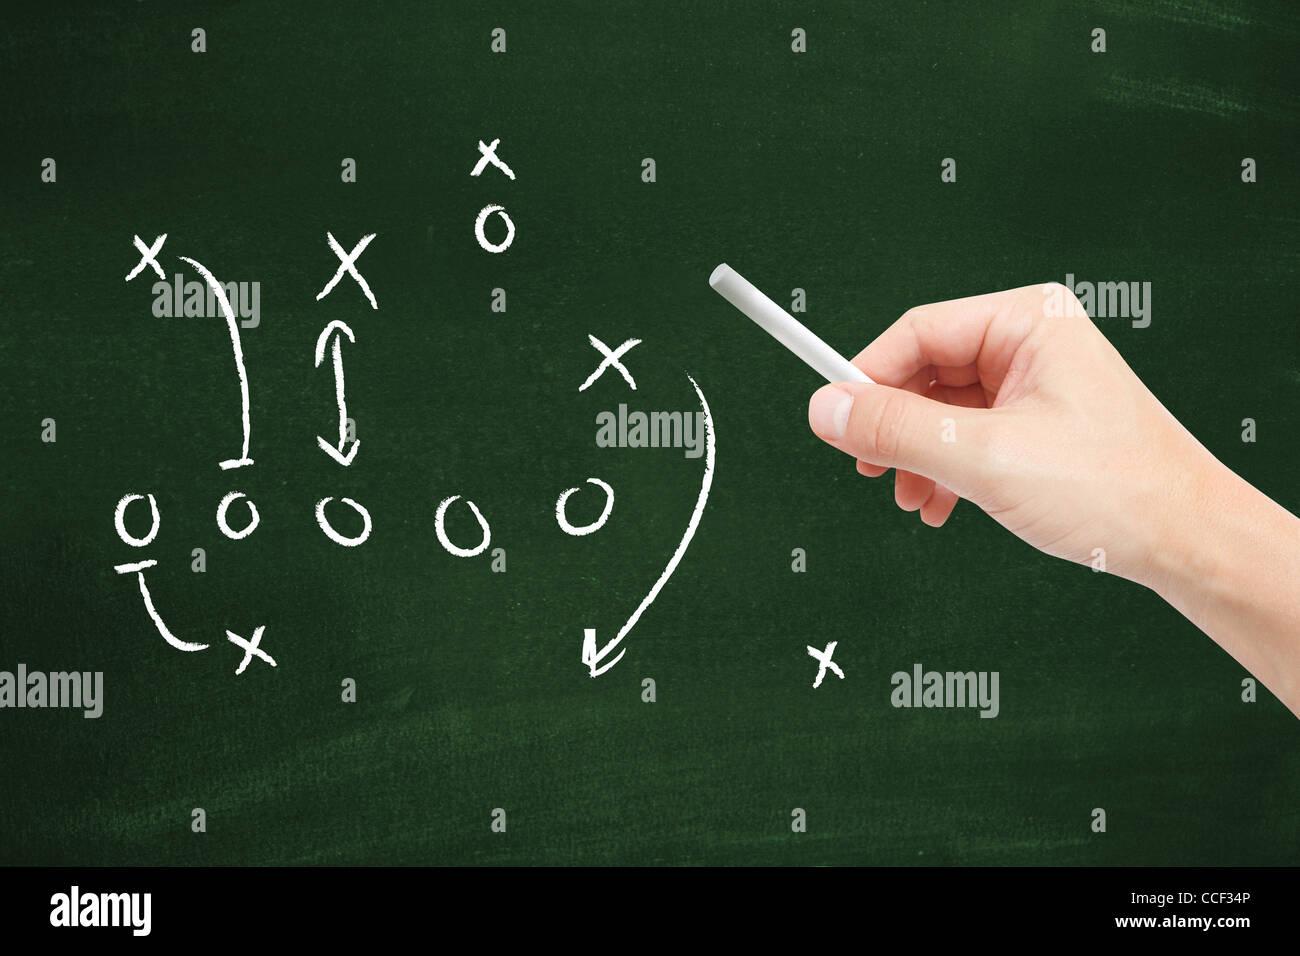 Sport tactics - Stock Image